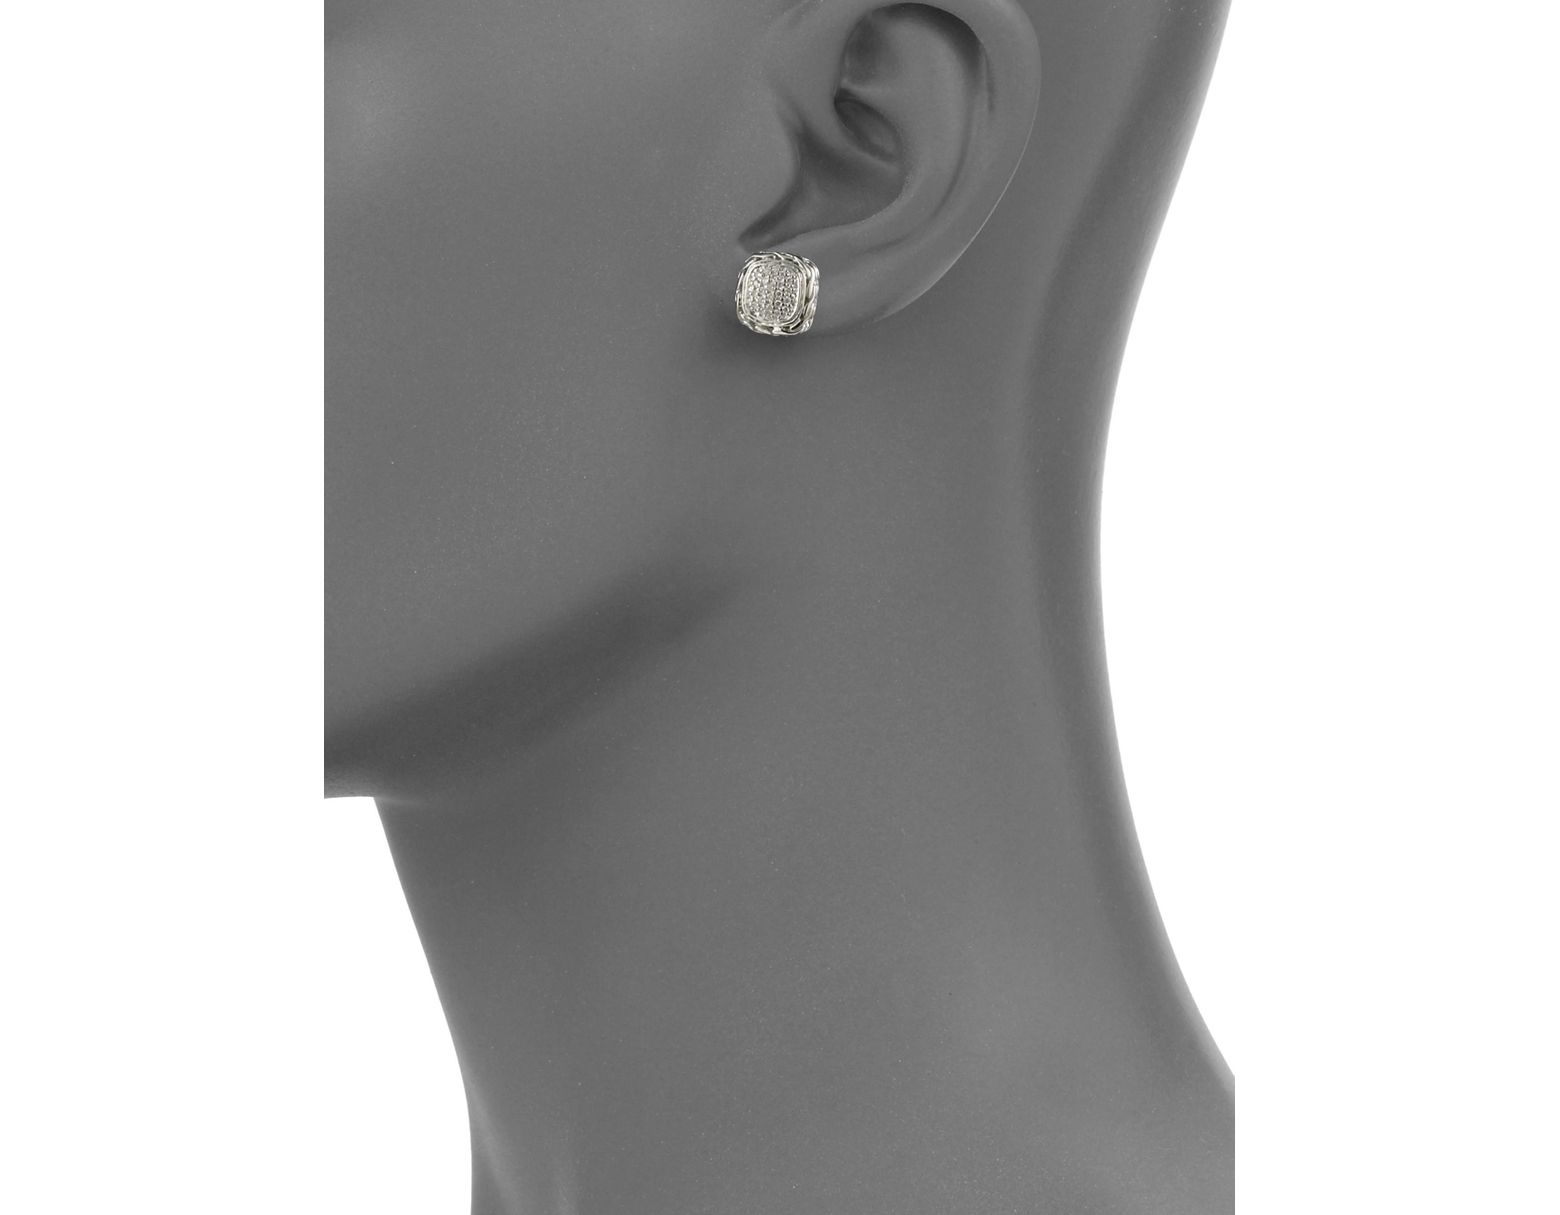 64314dfd24121 Women's Metallic Classic Chain Diamond & Sterling Silver Small Square Stud  Earrings